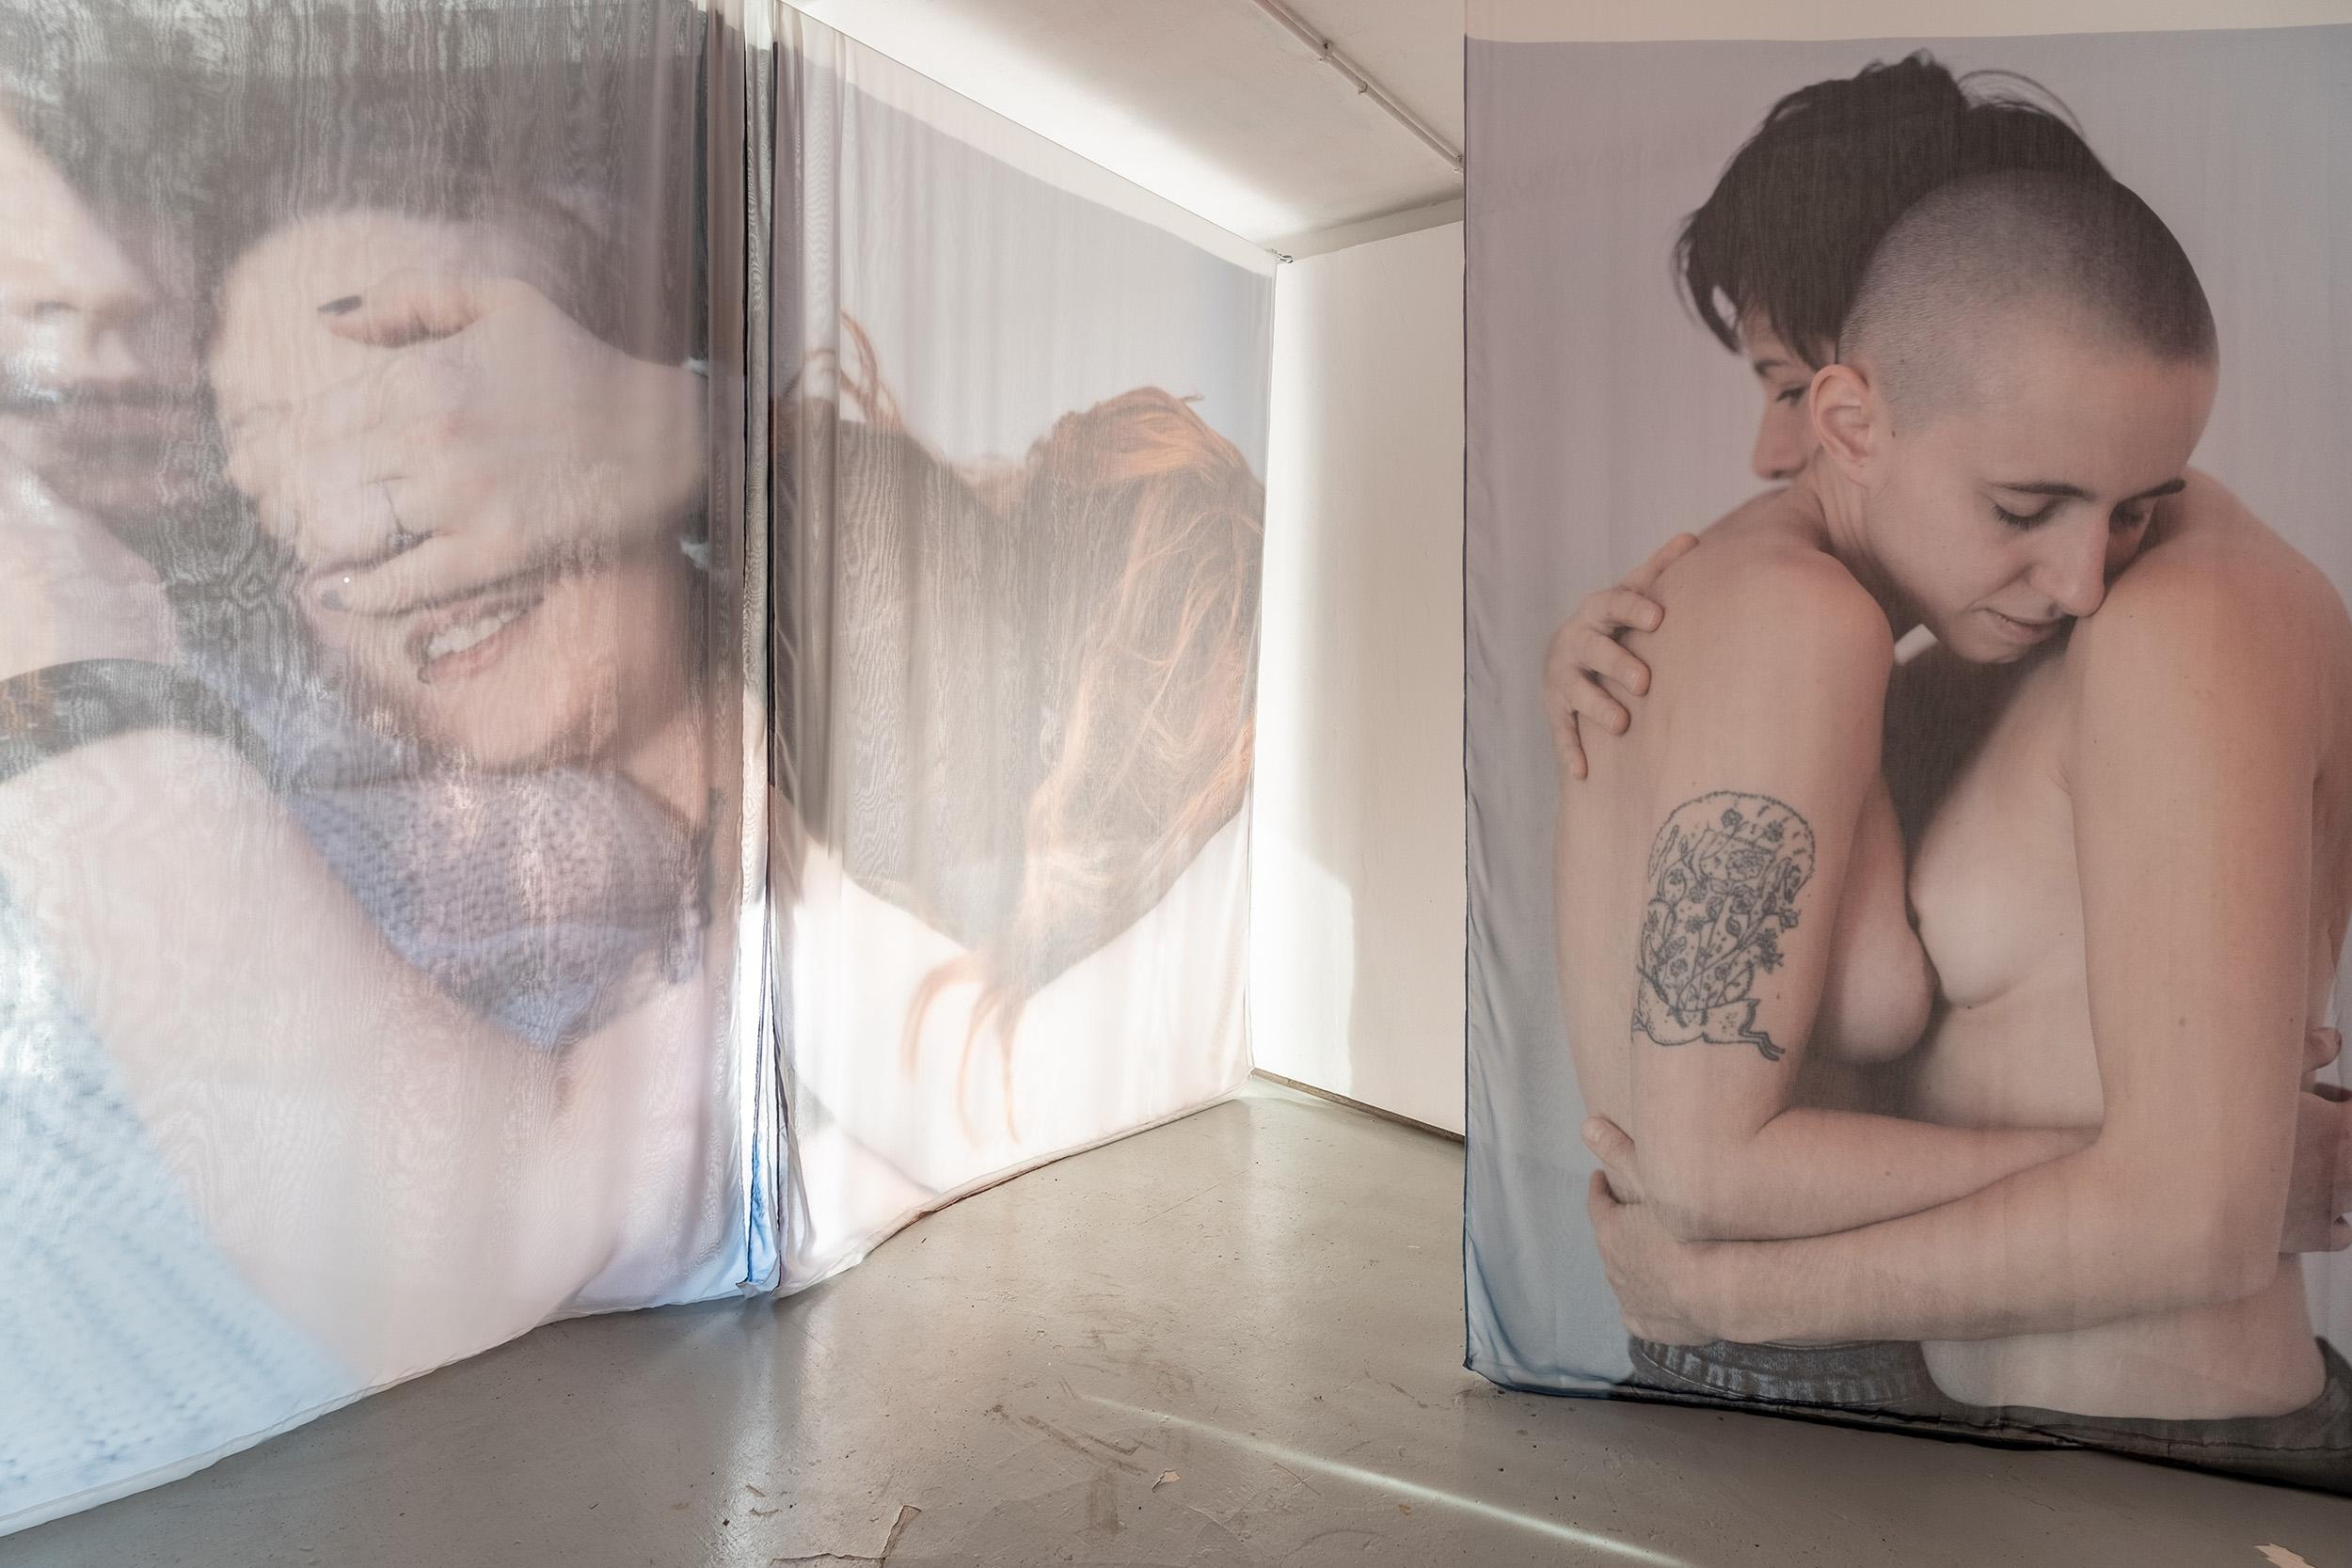 [EN/PL] 'LEZBY' by Karolina Sobel at Stroboskop Art Space